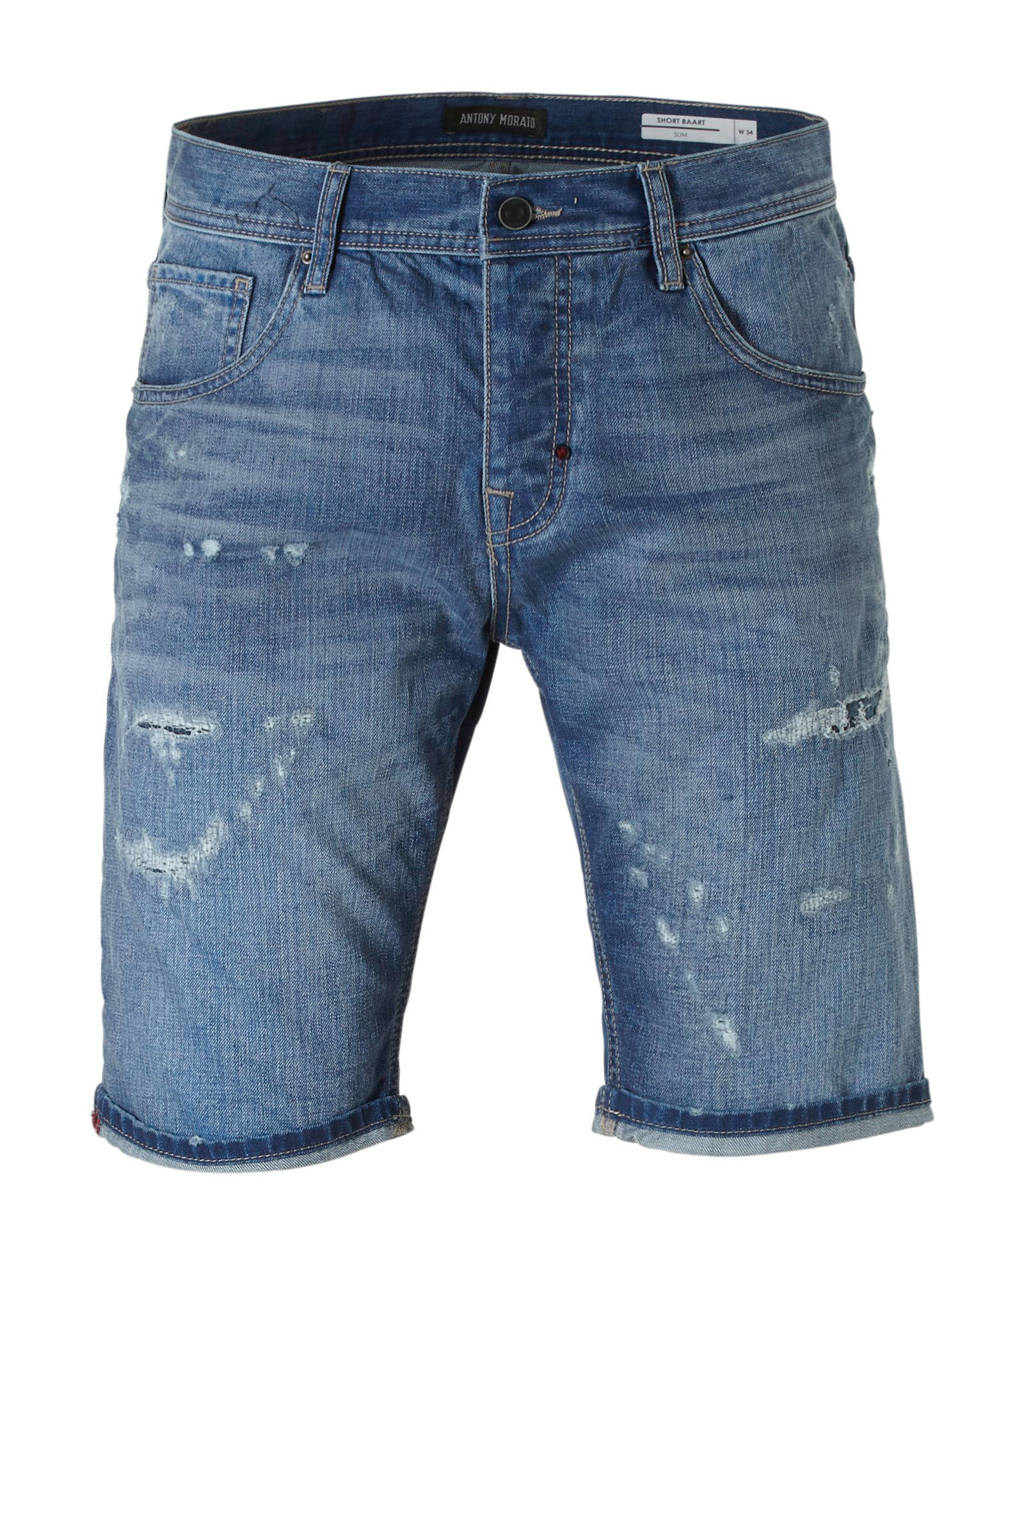 Antony Morato slim fit jeans short, Blauw